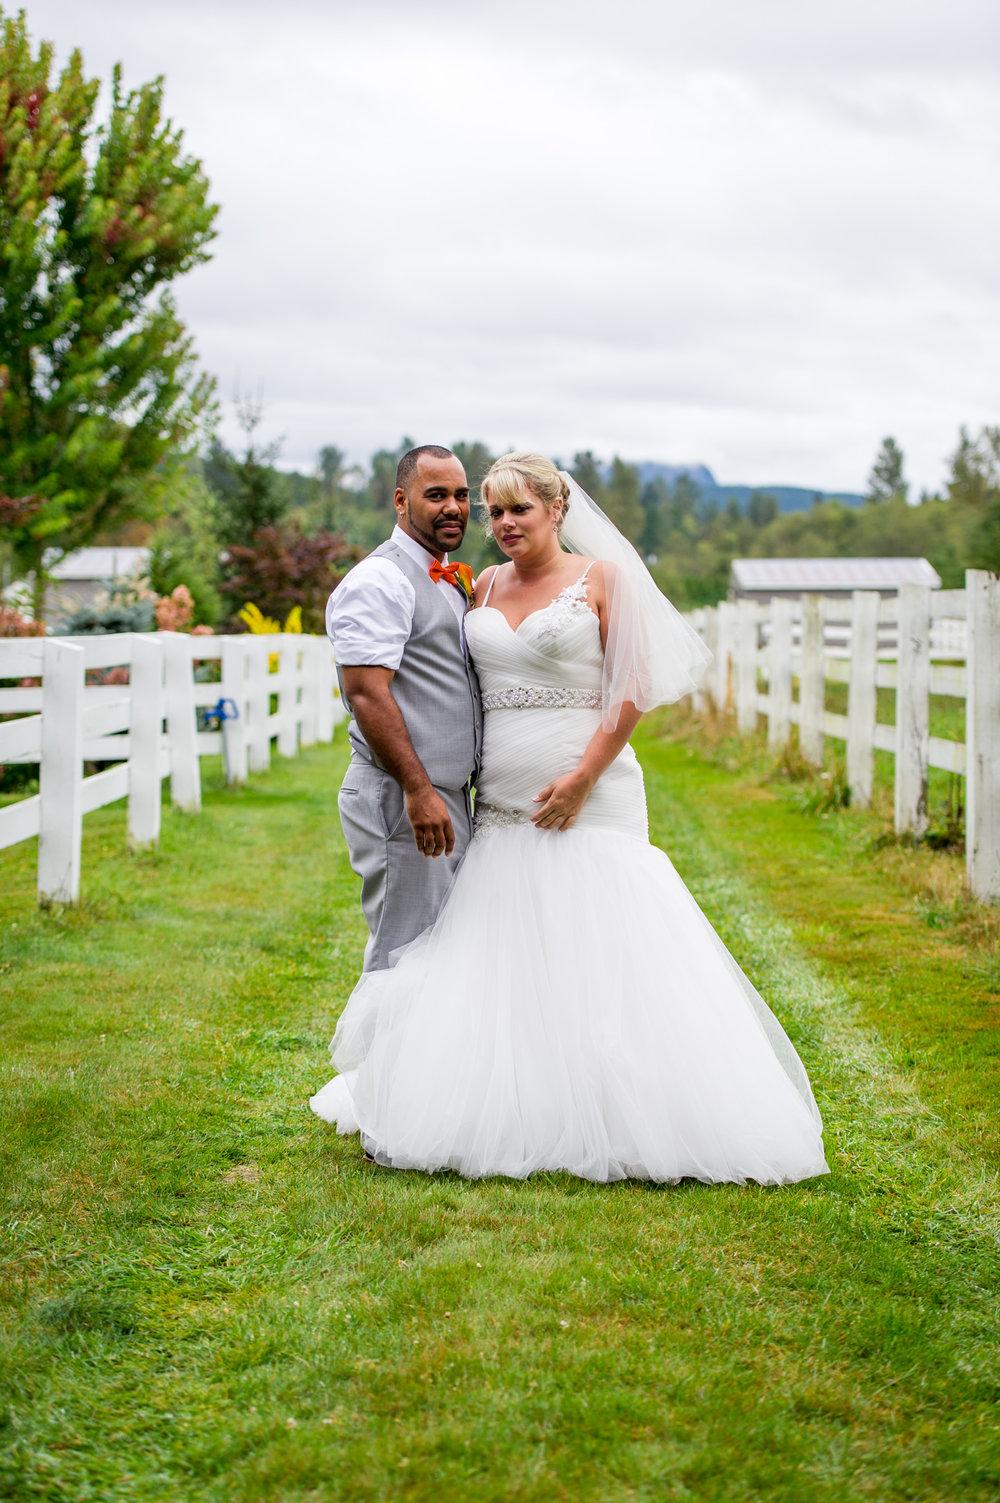 20160917_Tat_Renee and Marcus Wedding-27.jpg